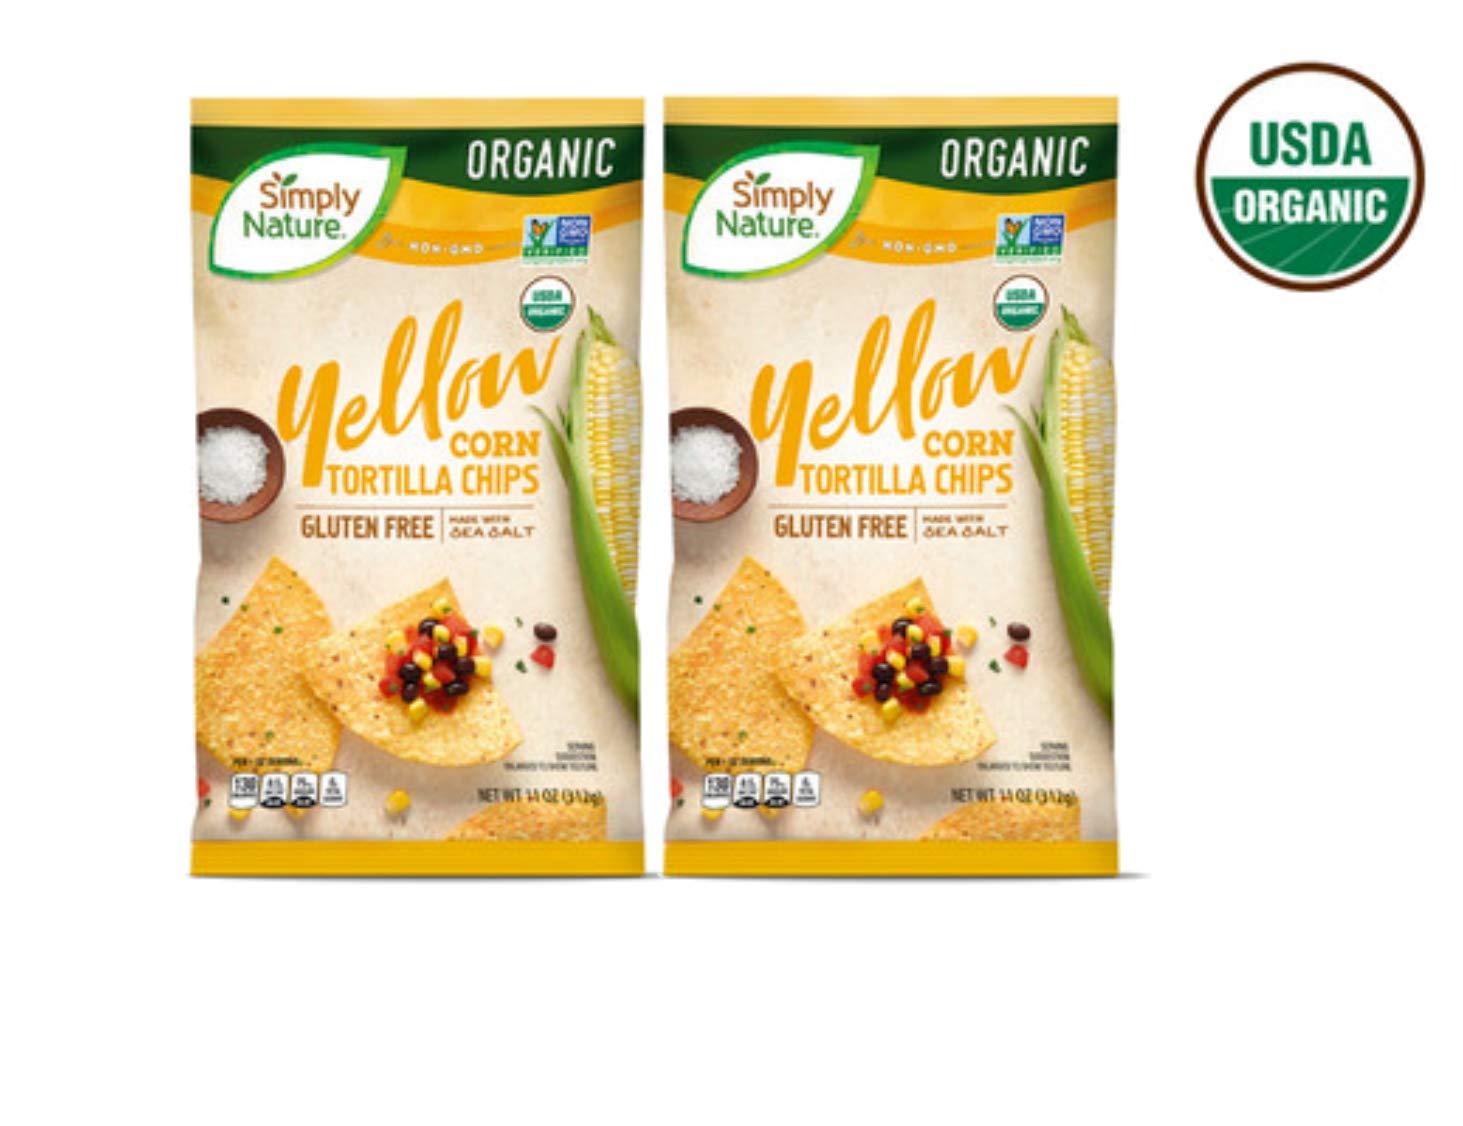 Simply Nature USDA Organic Gluten-Free Yellow Corn Tortilla Chips Made with Sea Salt - 11 oz. (2 Bags)